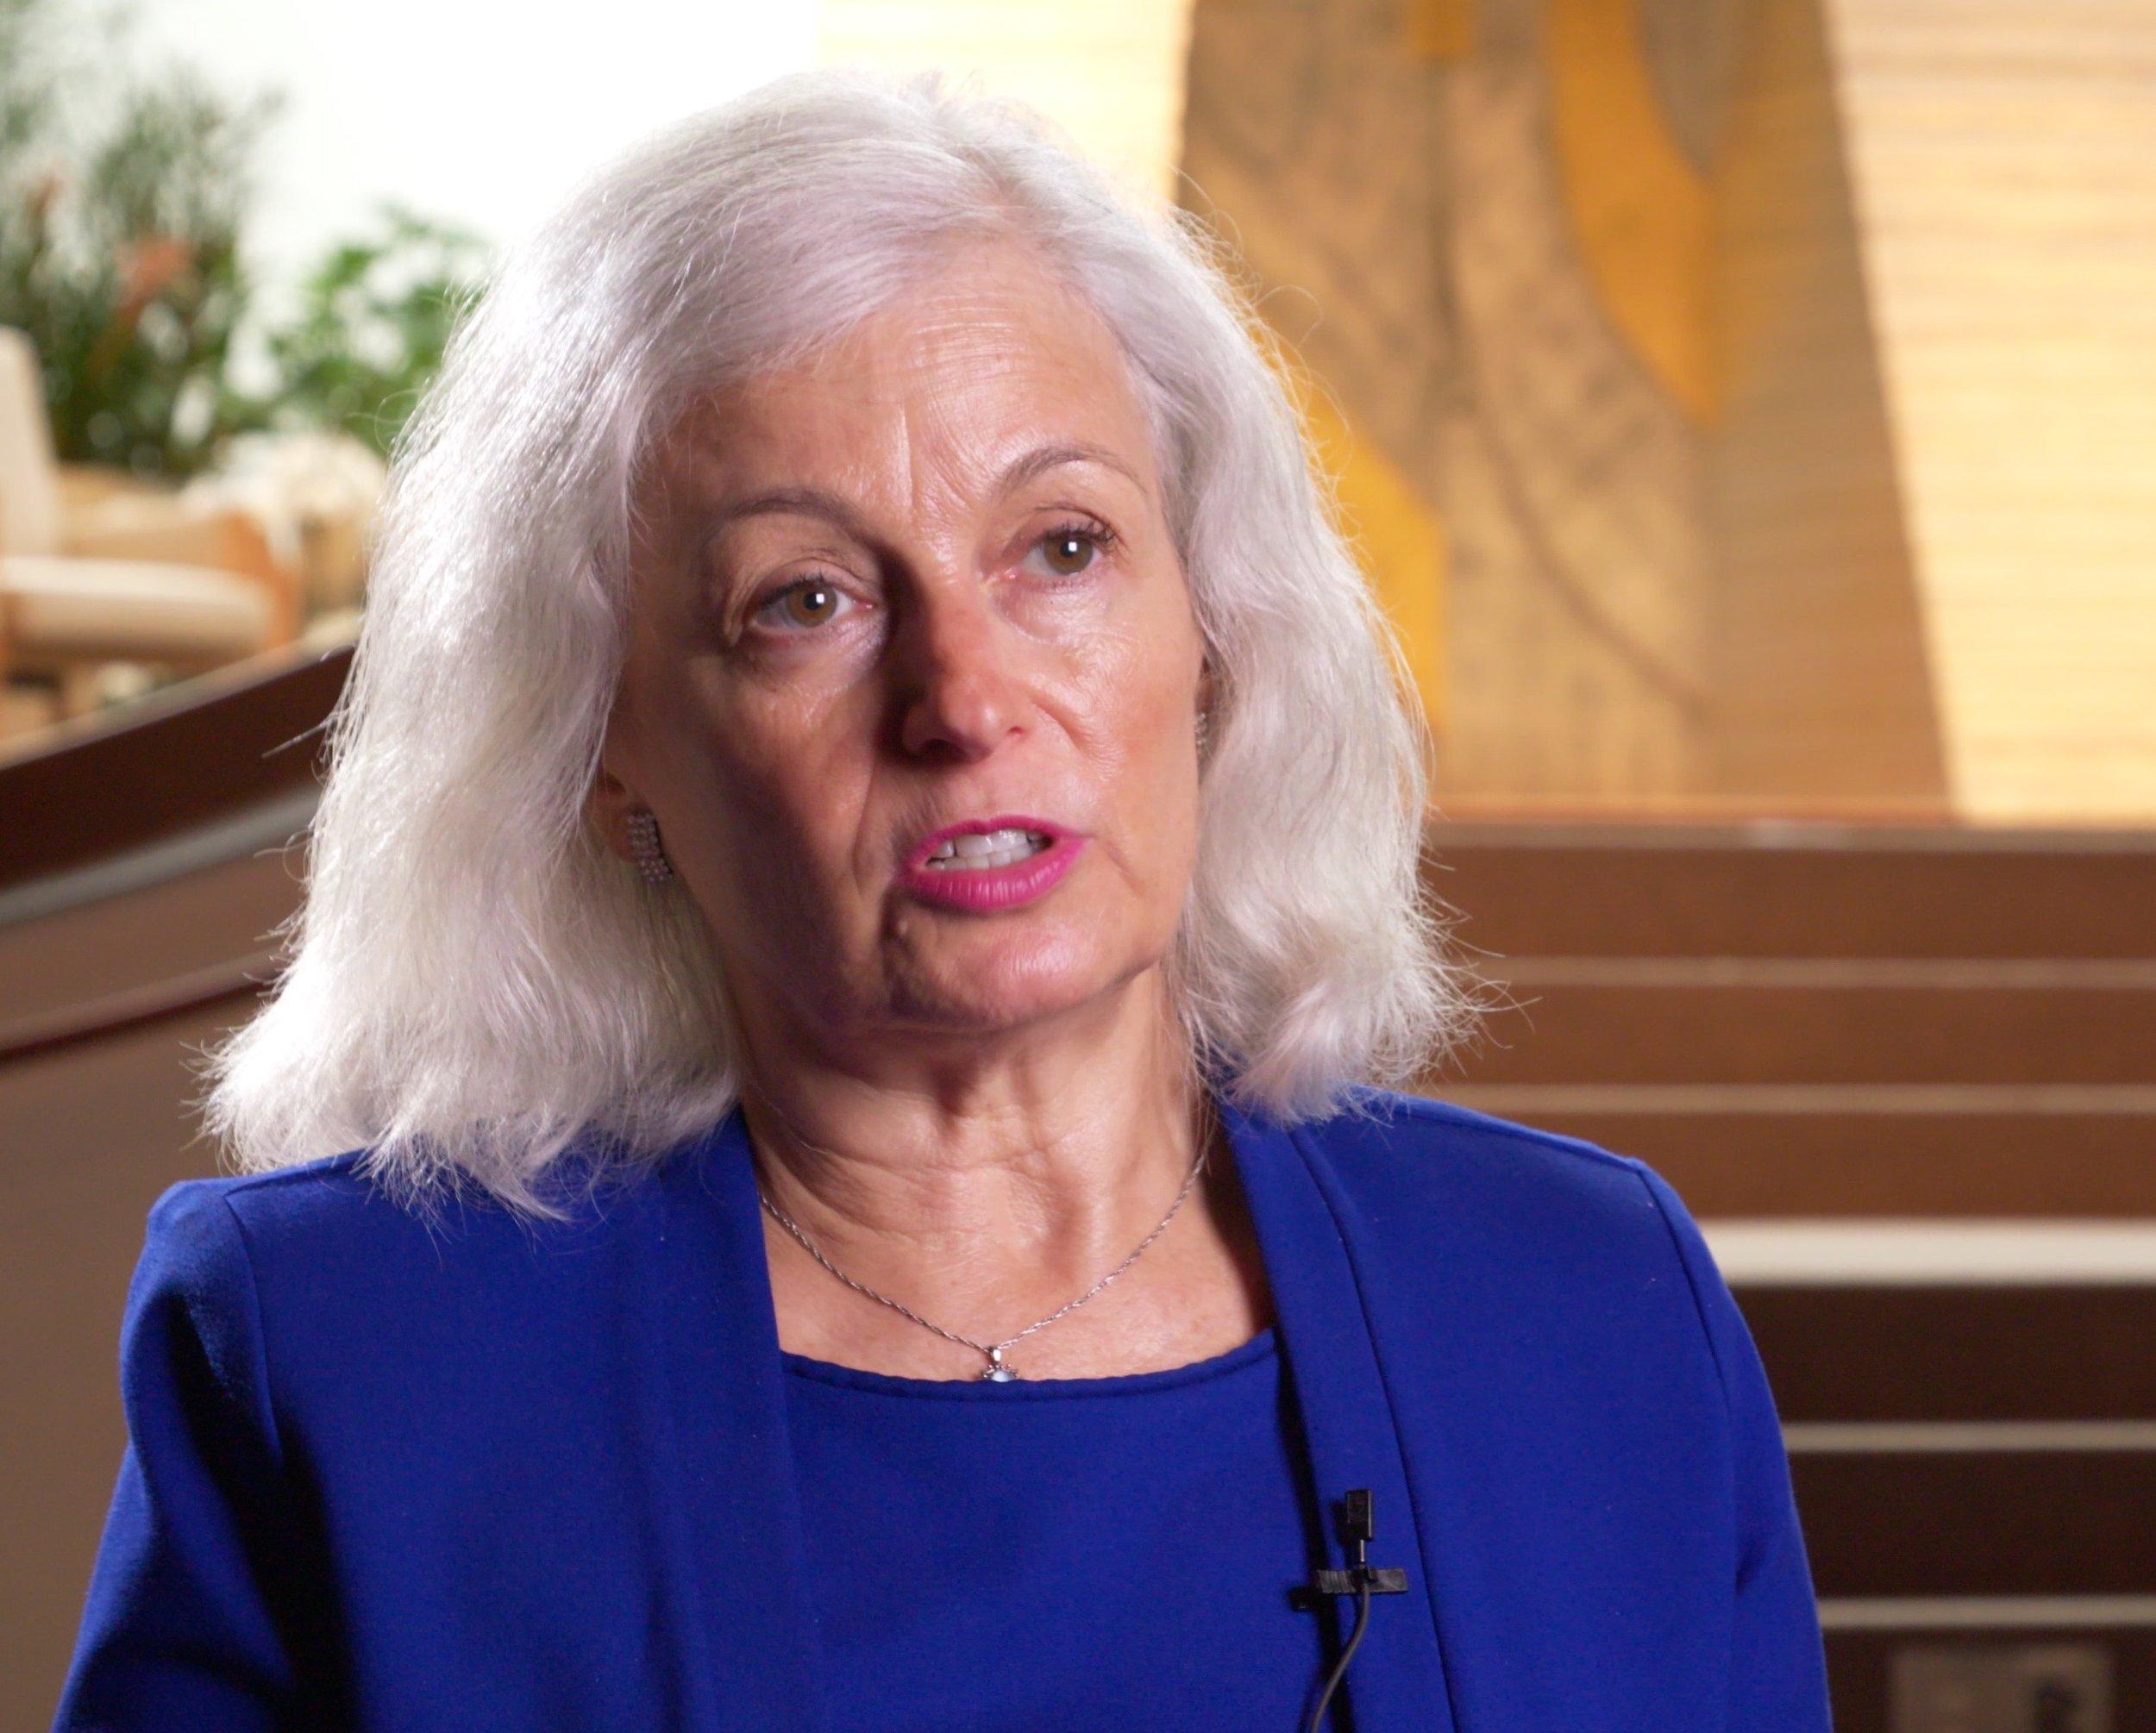 Rabbi Elaine Zecher